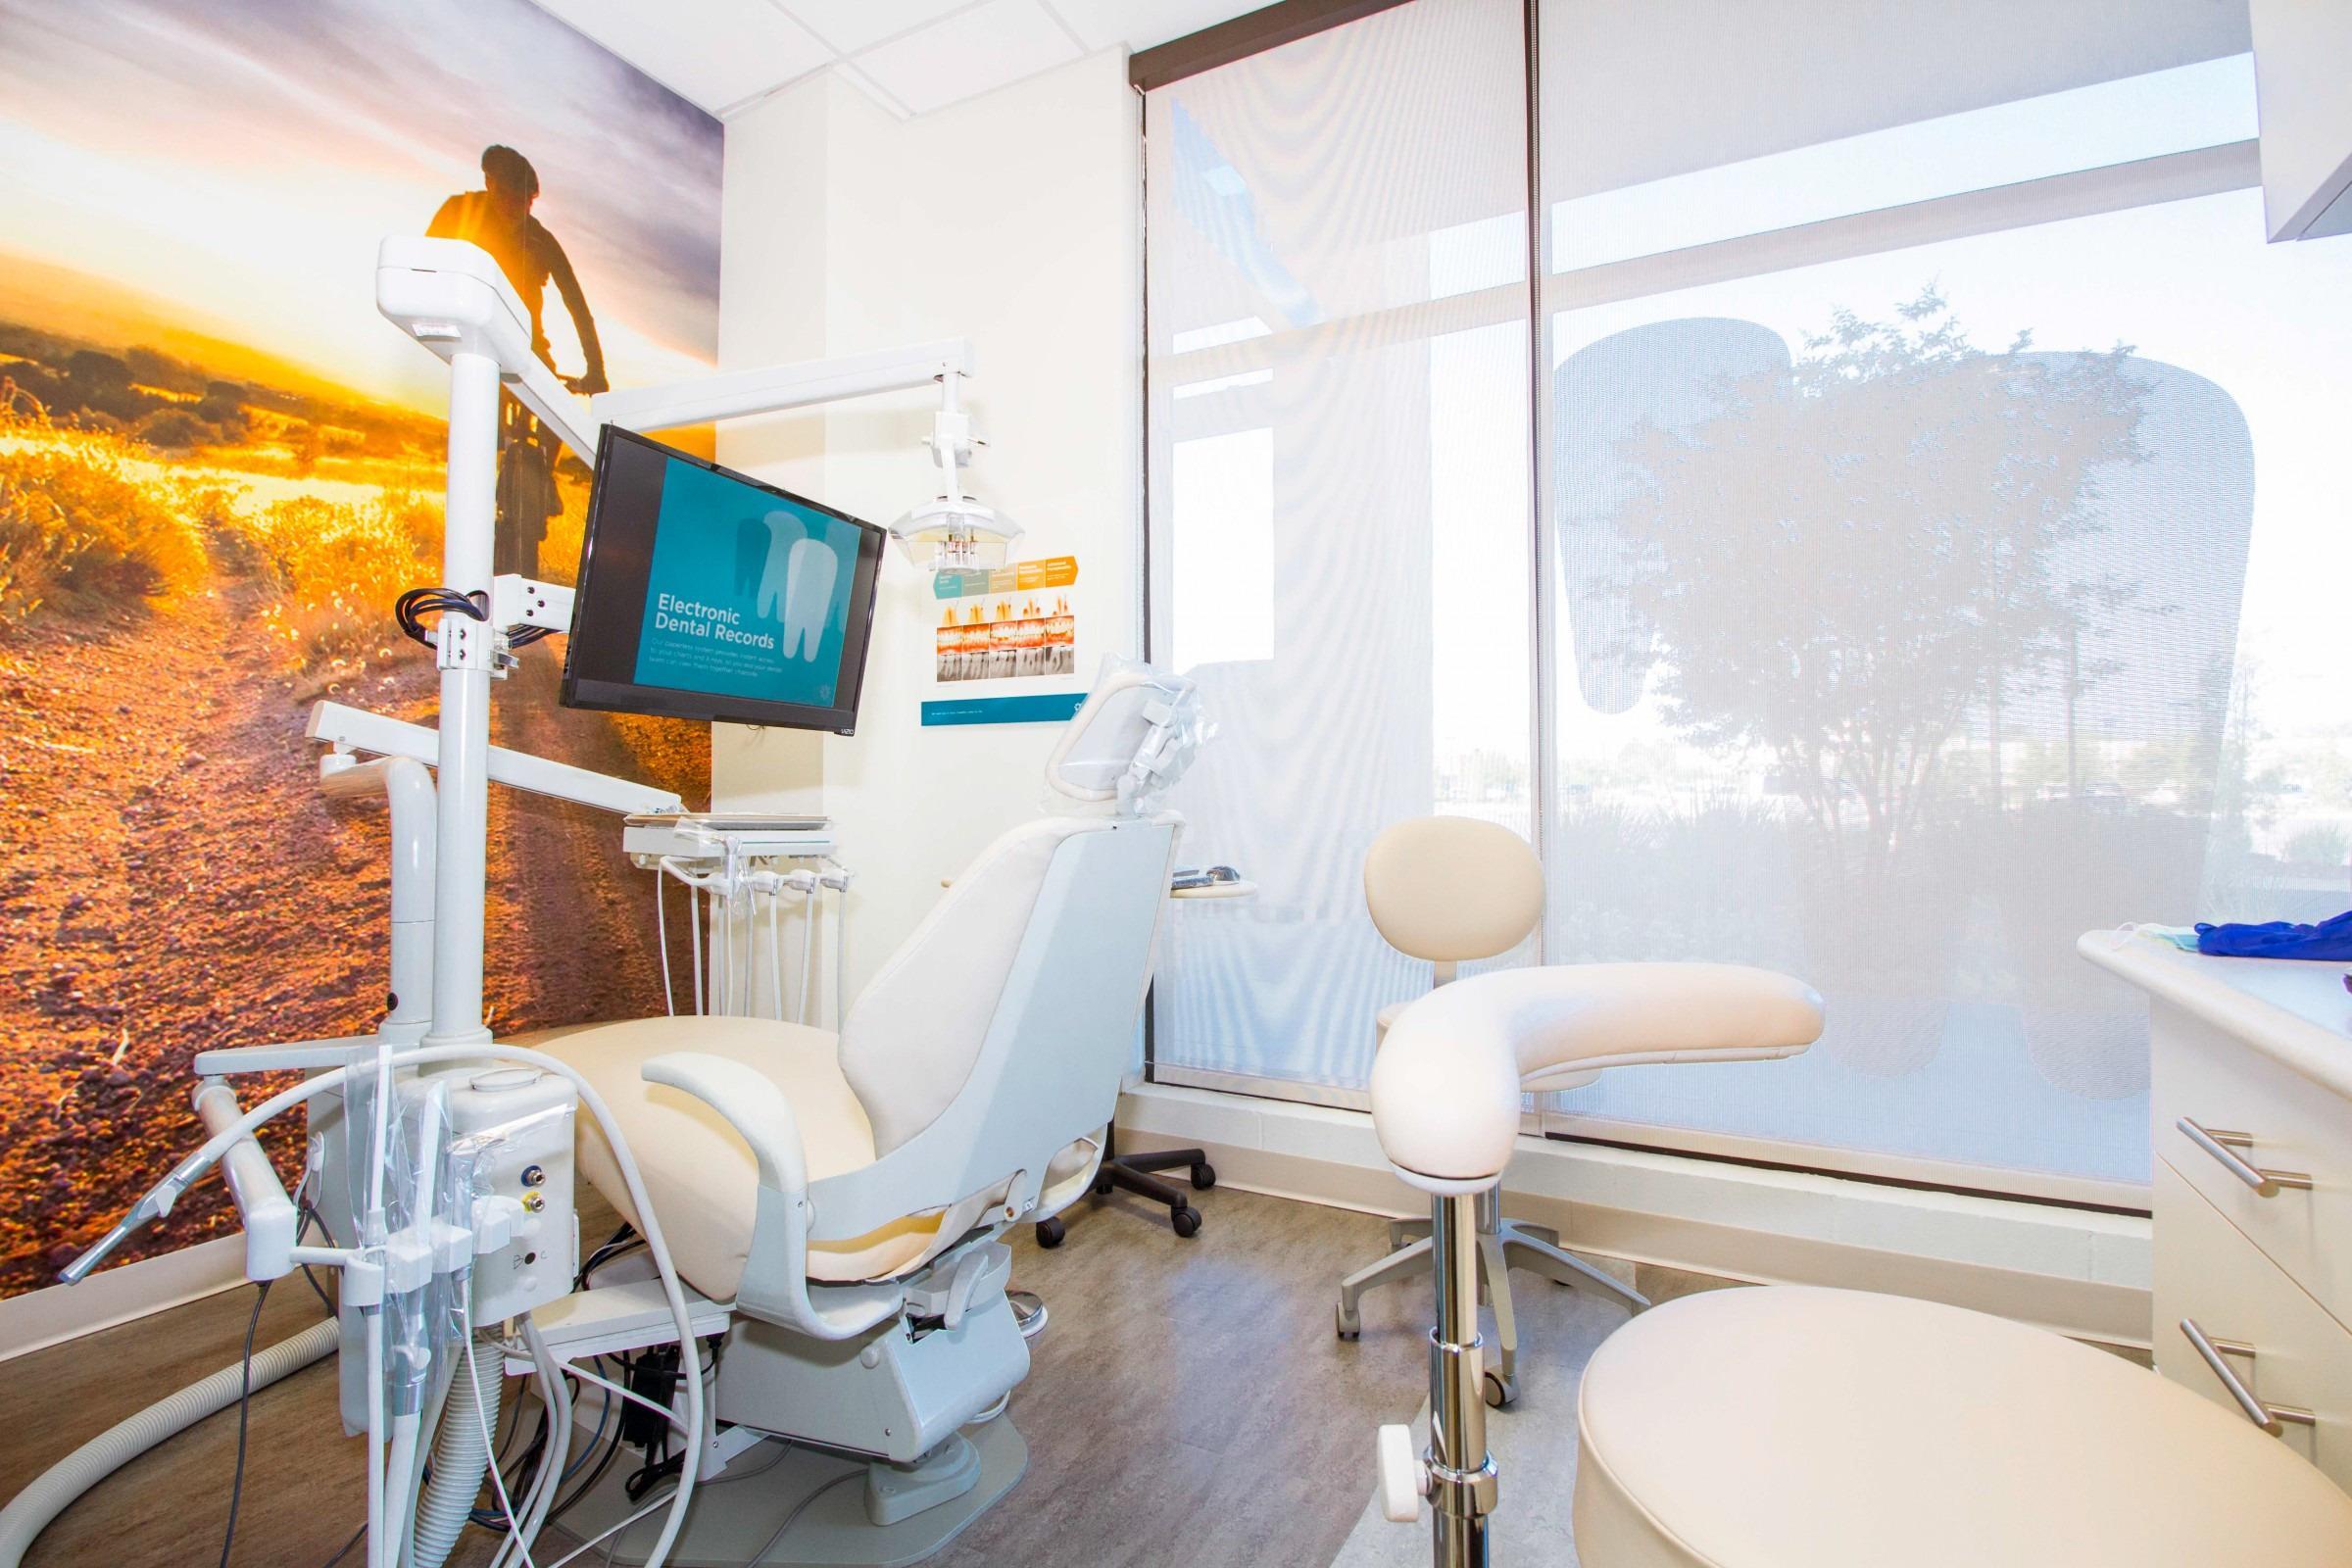 Lafayette Modern Dentistry image 5